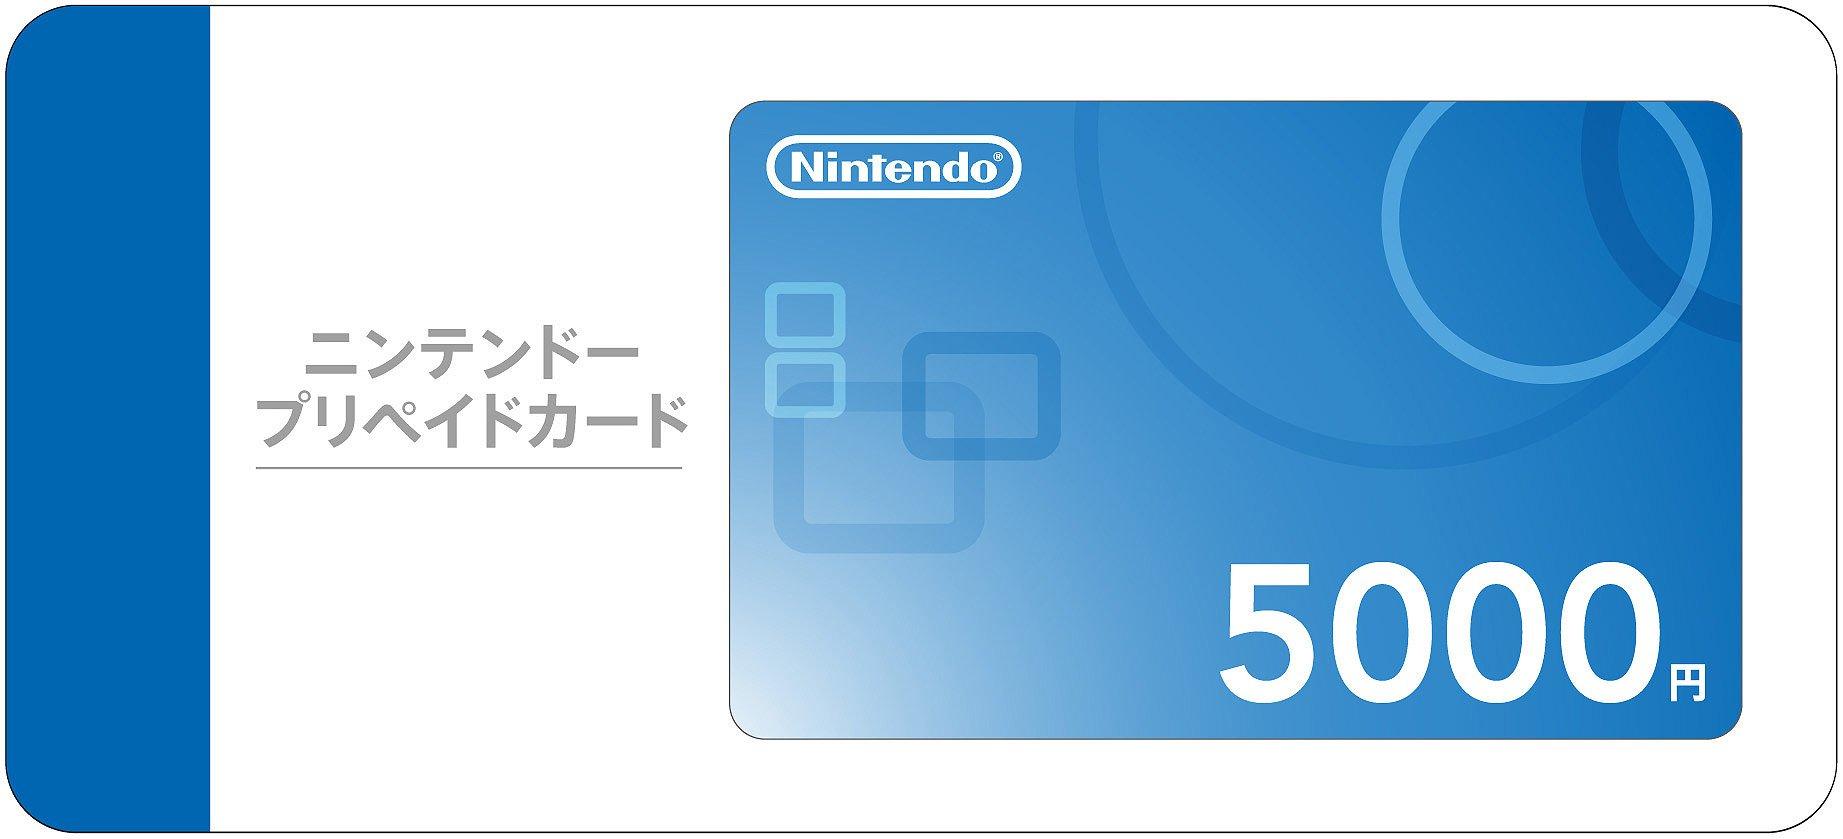 The Nintendo prepaid card of 5000 yen